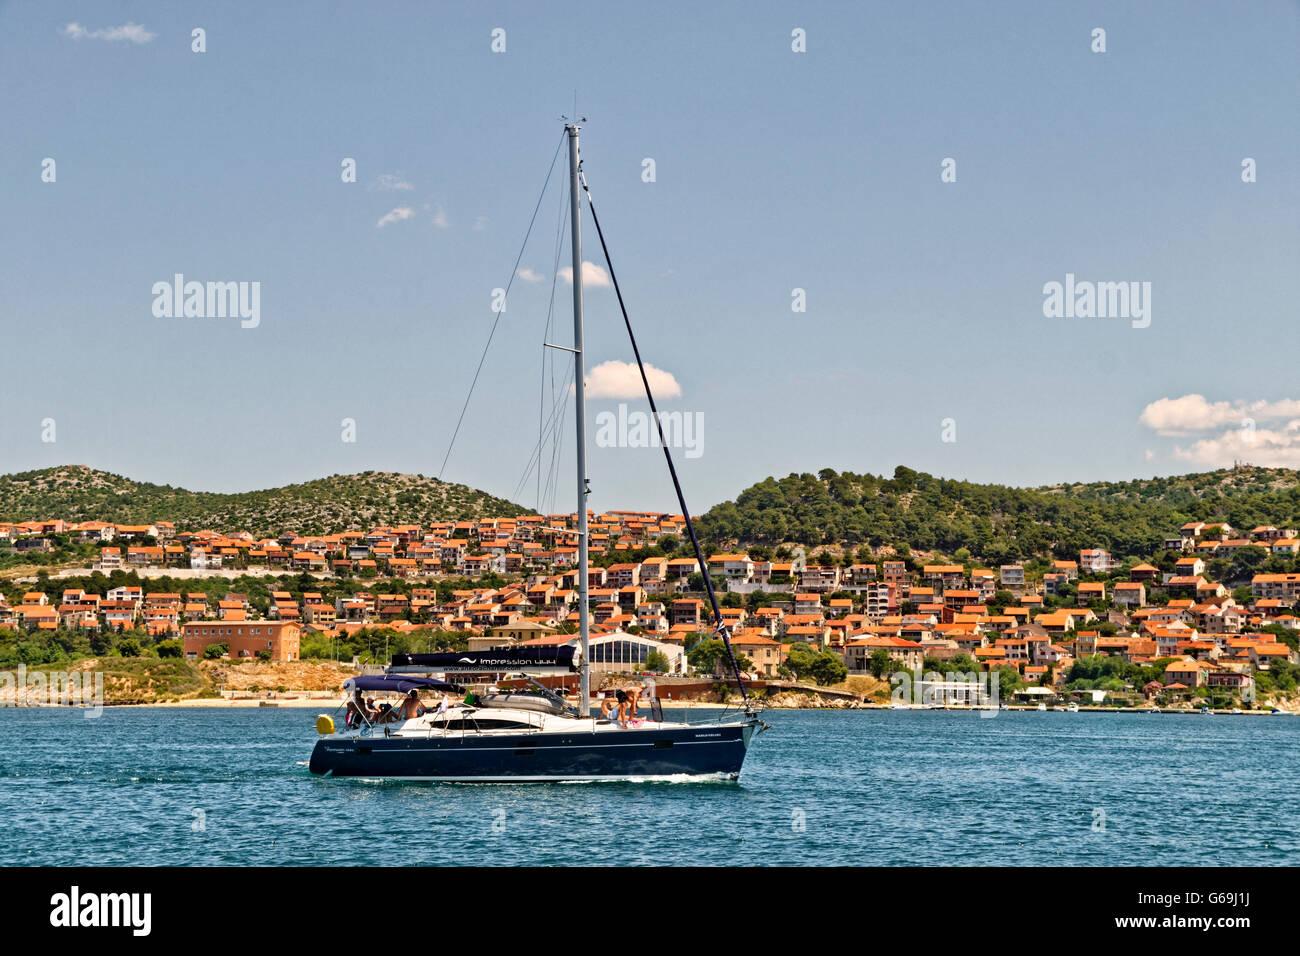 Cruising yacht motoring past Sibenik on the Cikola River, Dalmatia, Croatia. Stock Photo